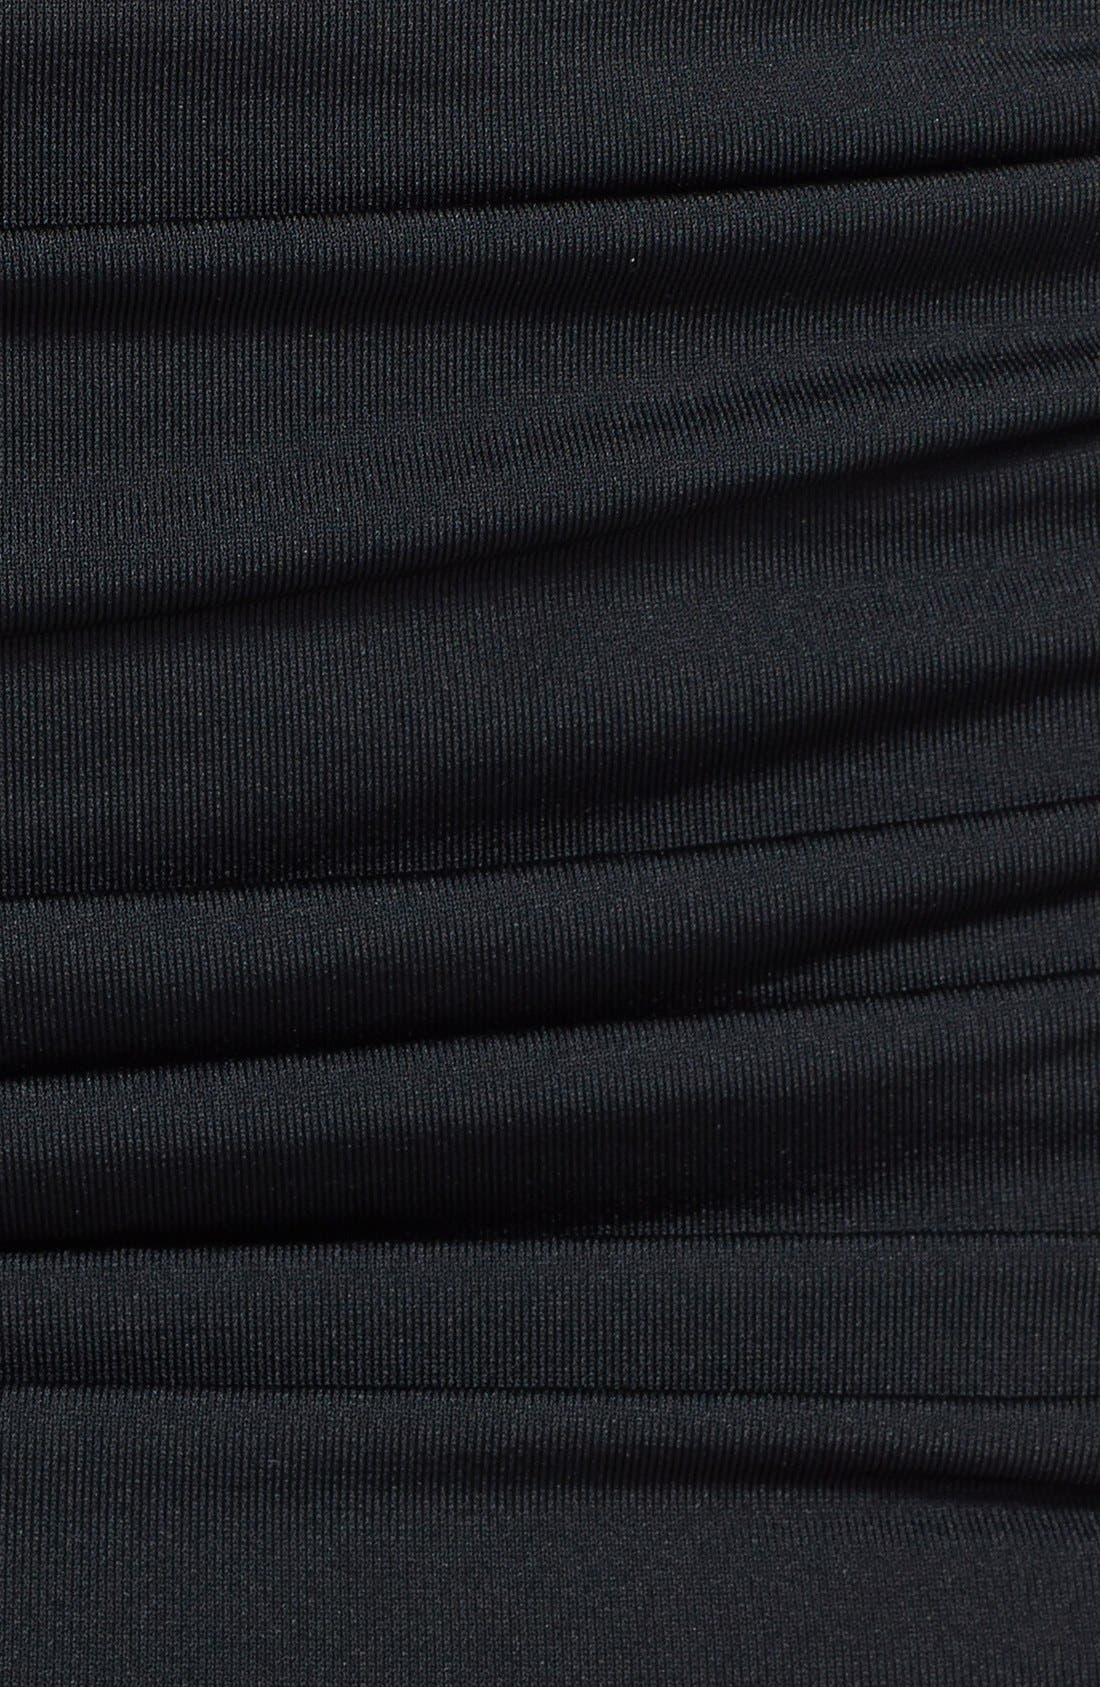 Carmen Marc Valvo 'Cape Town Beach' Shirred Skirted Bikini Bottoms,                             Alternate thumbnail 5, color,                             Luxe Black